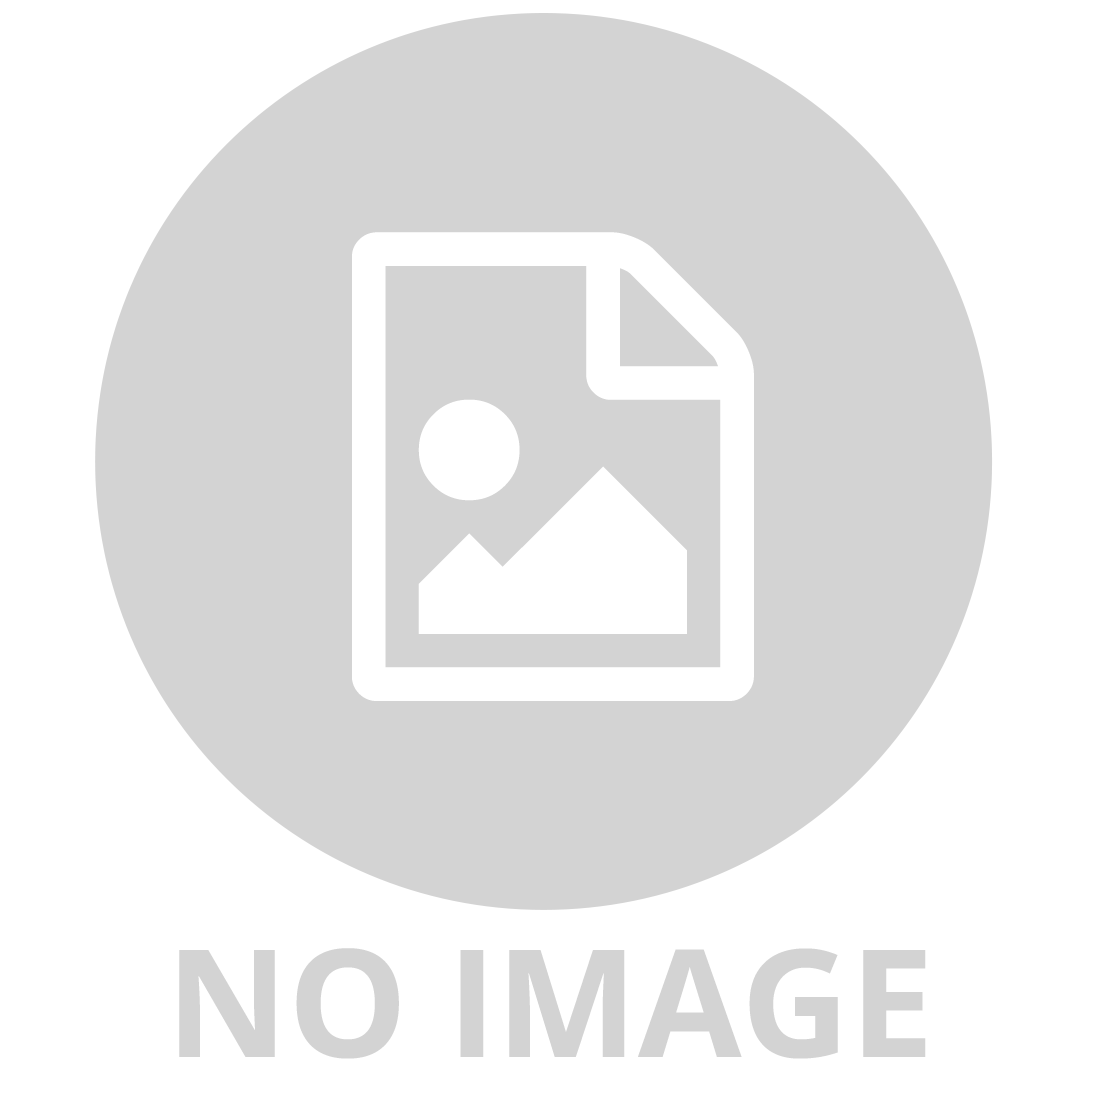 HOT WHEELS R/C SHARK ATTACK 1:24 VEHICLE